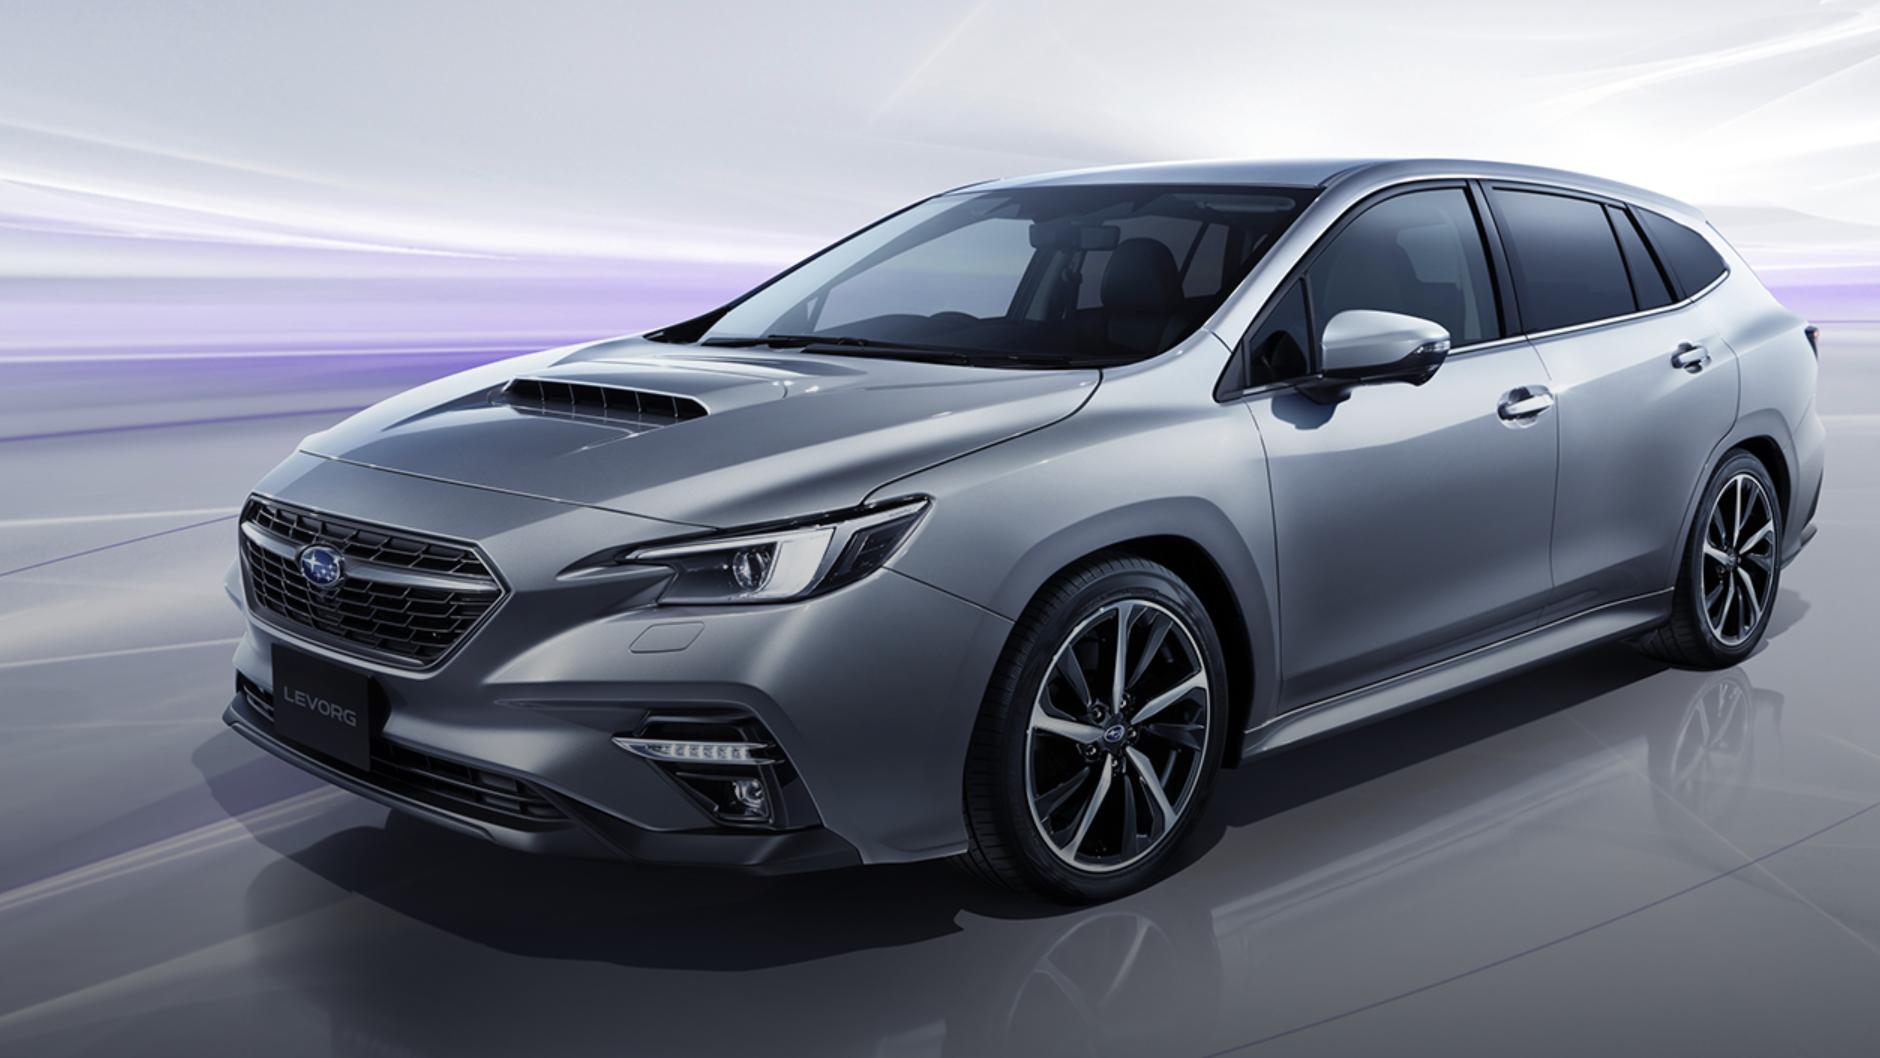 Subaru 全新 Levorg、Impreza 確定導入,2021 引進計劃曝光